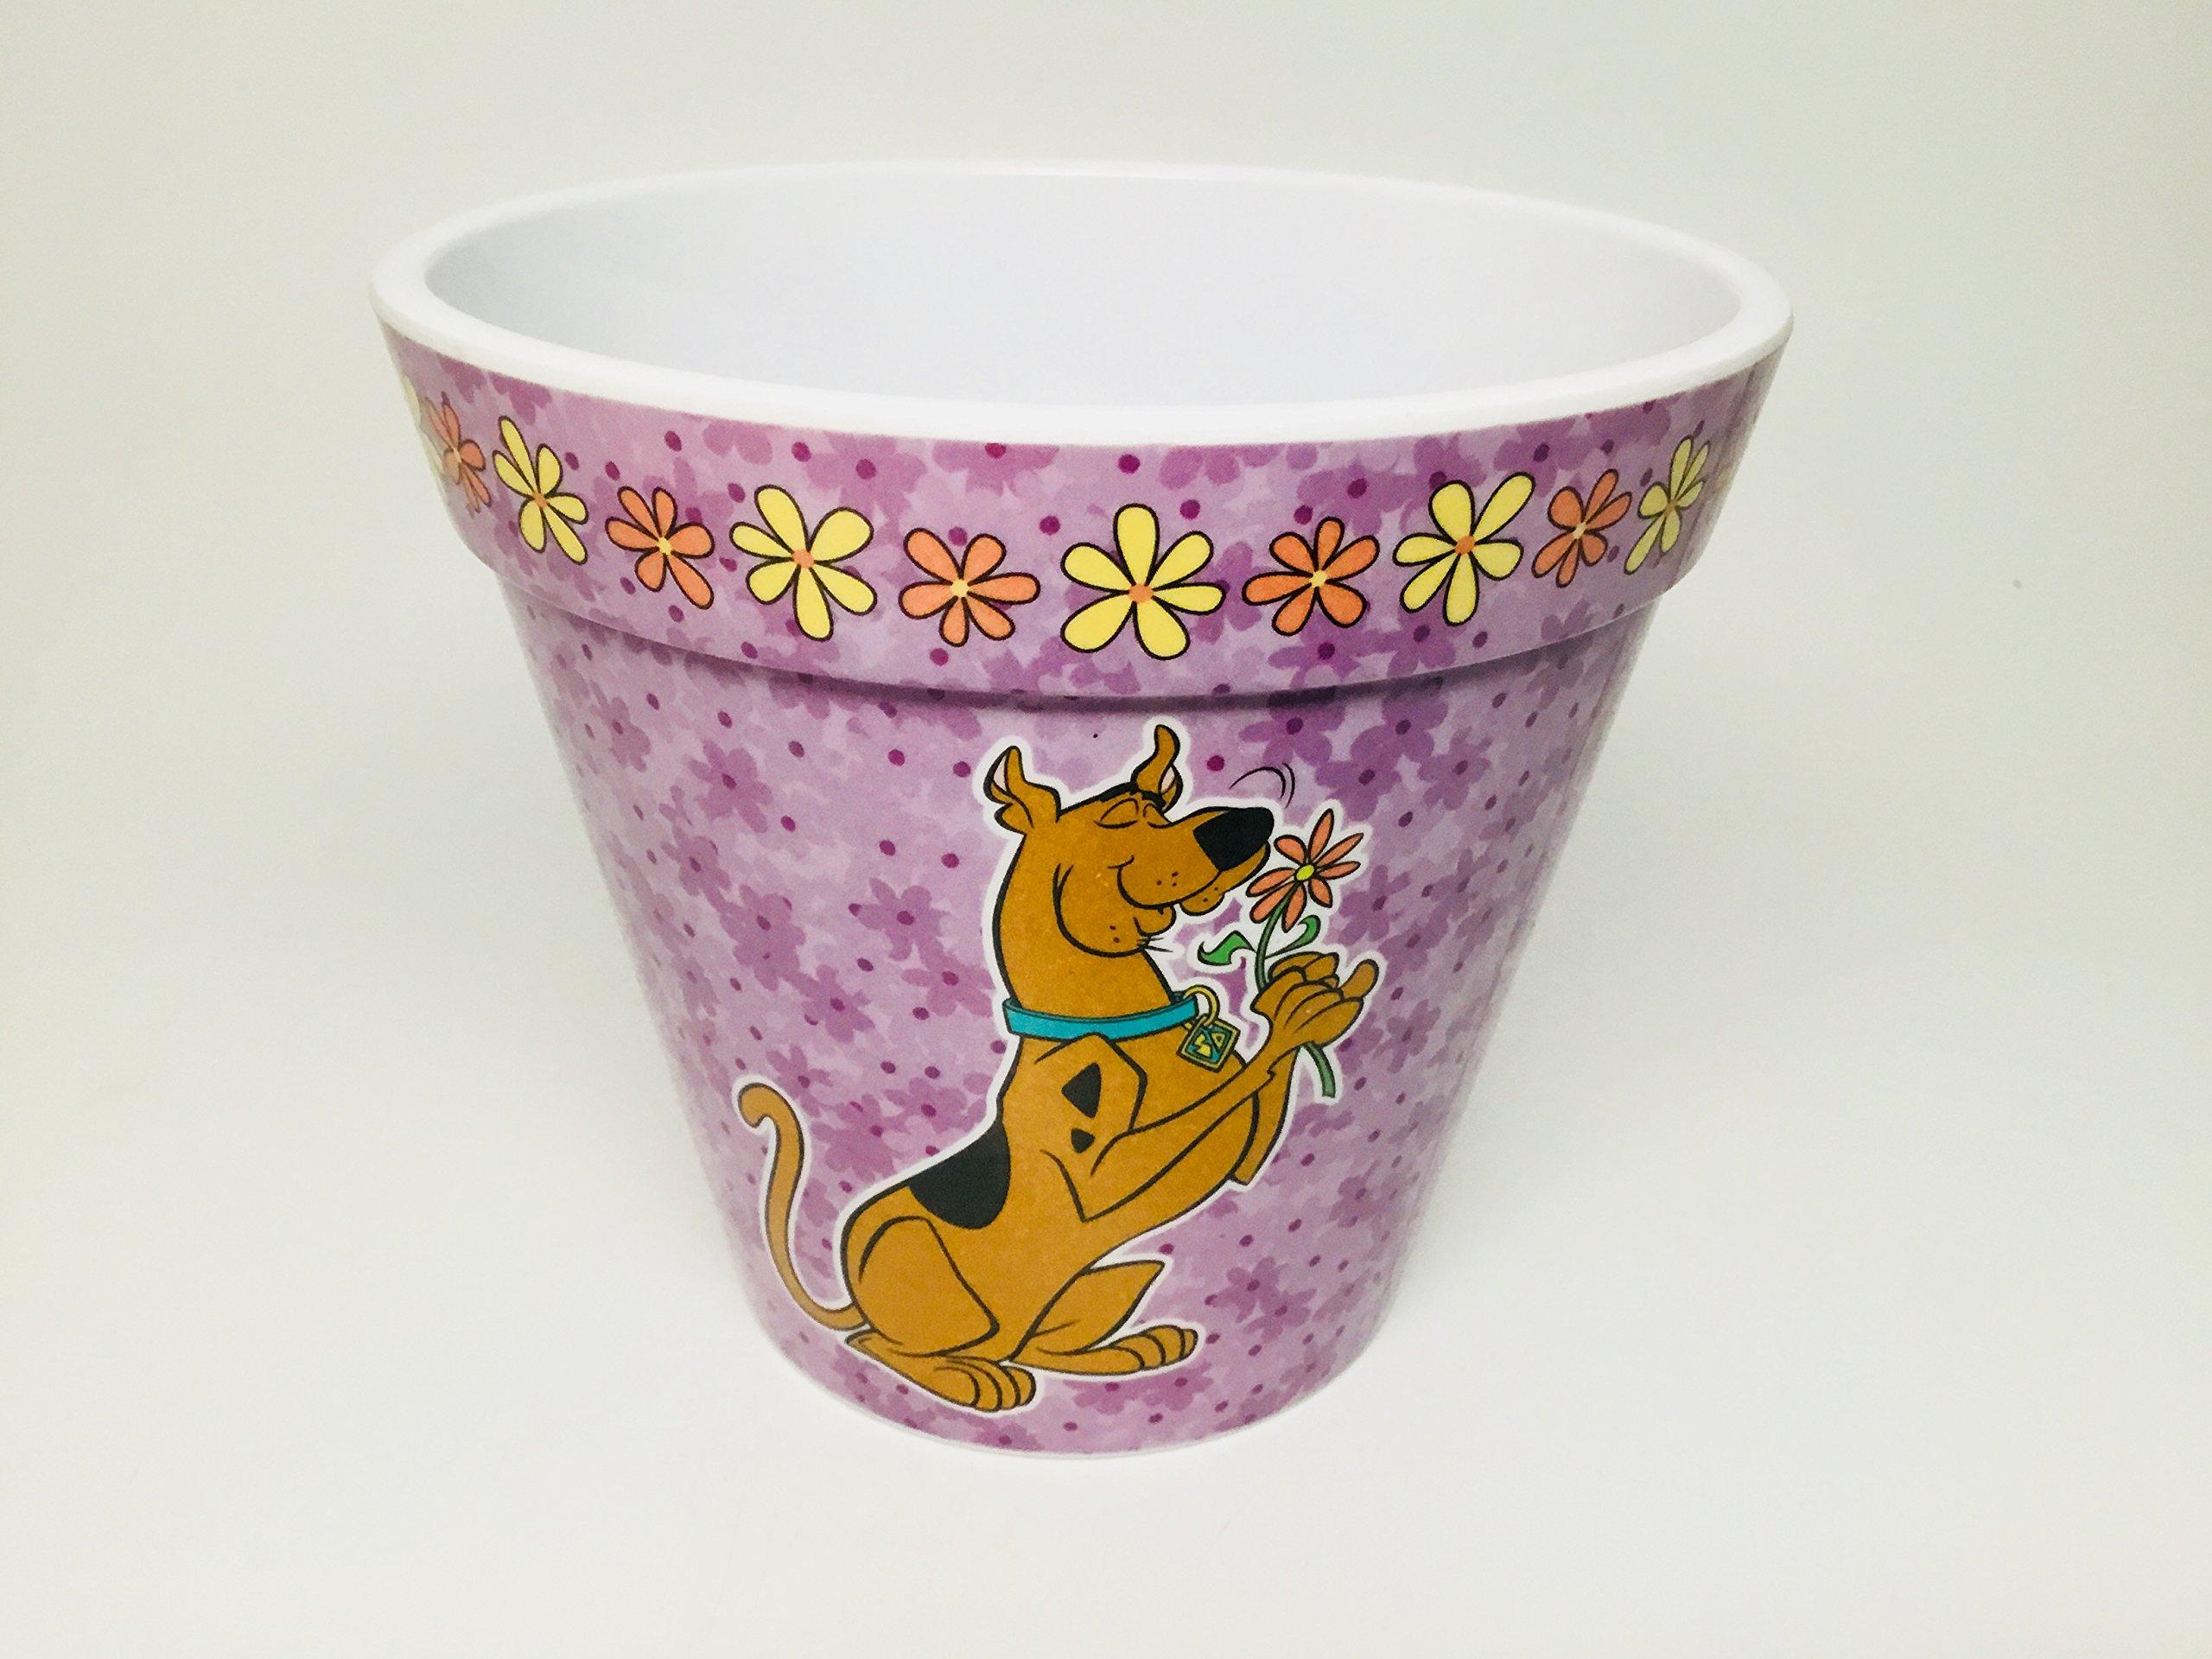 Scooby-Doo Flower Pot by Zak Designs